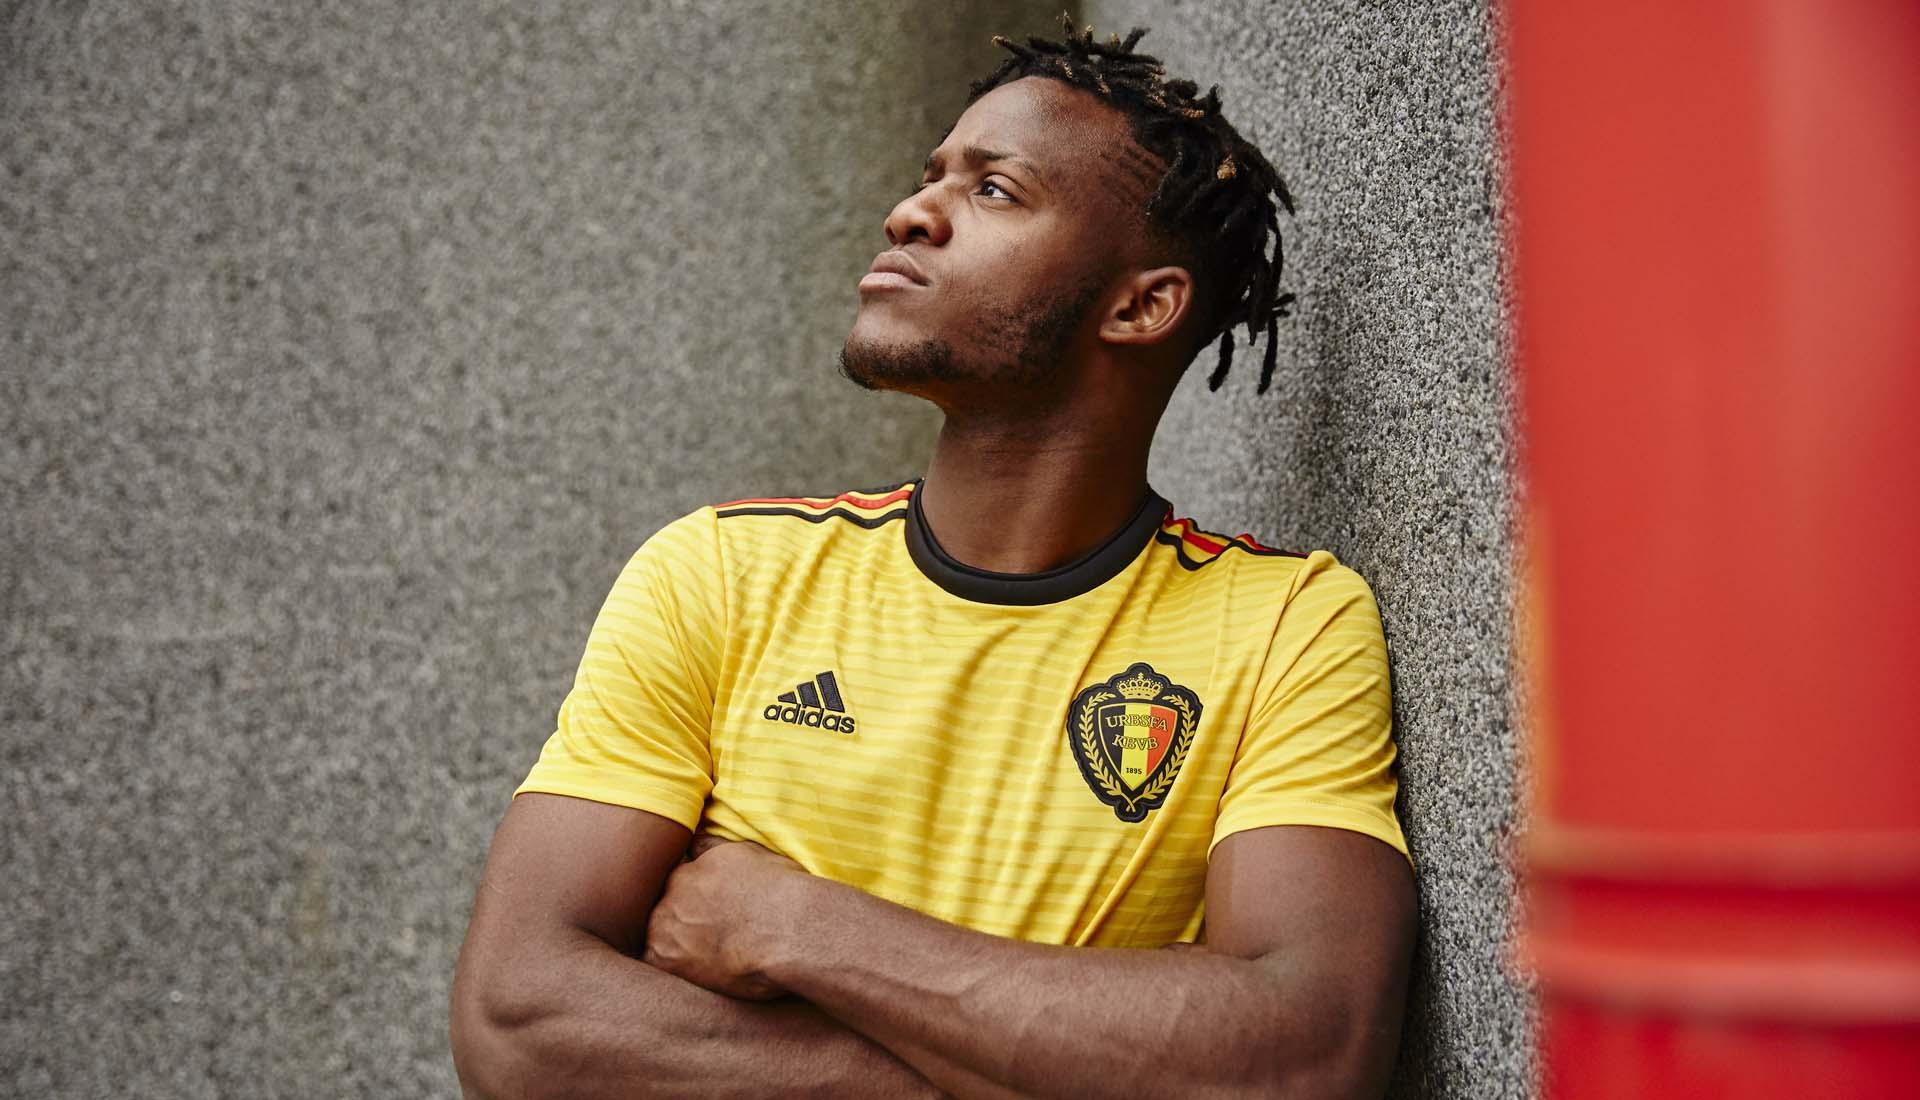 ce737647742 adidas Launch The Belgium 2018 World Cup Away Shirt - SoccerBible